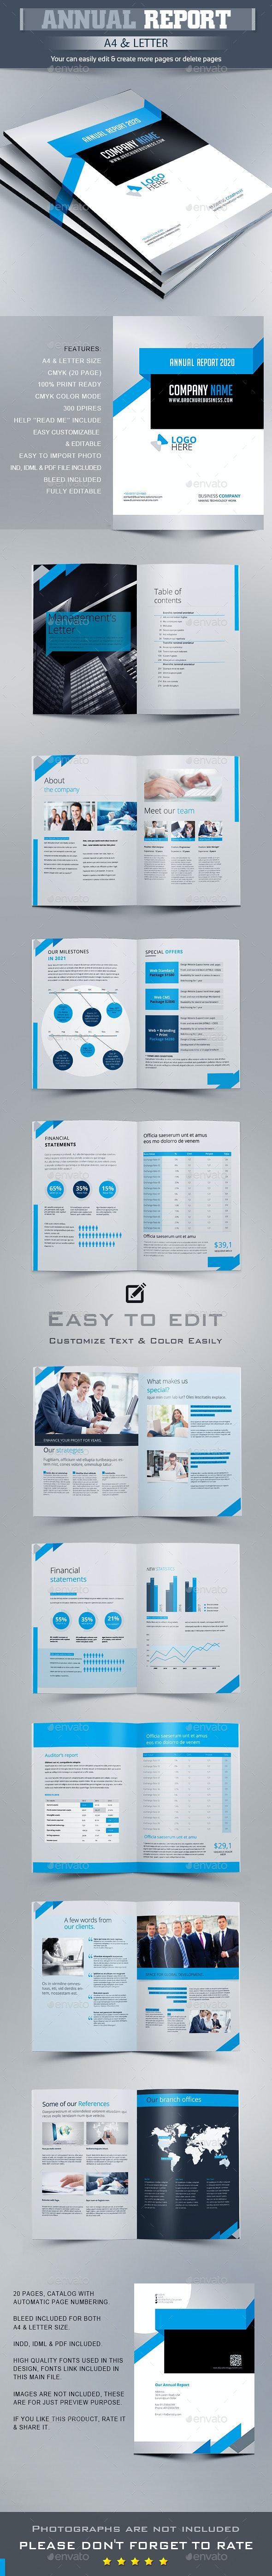 Annual Report Brochure - Brochures Print Templates